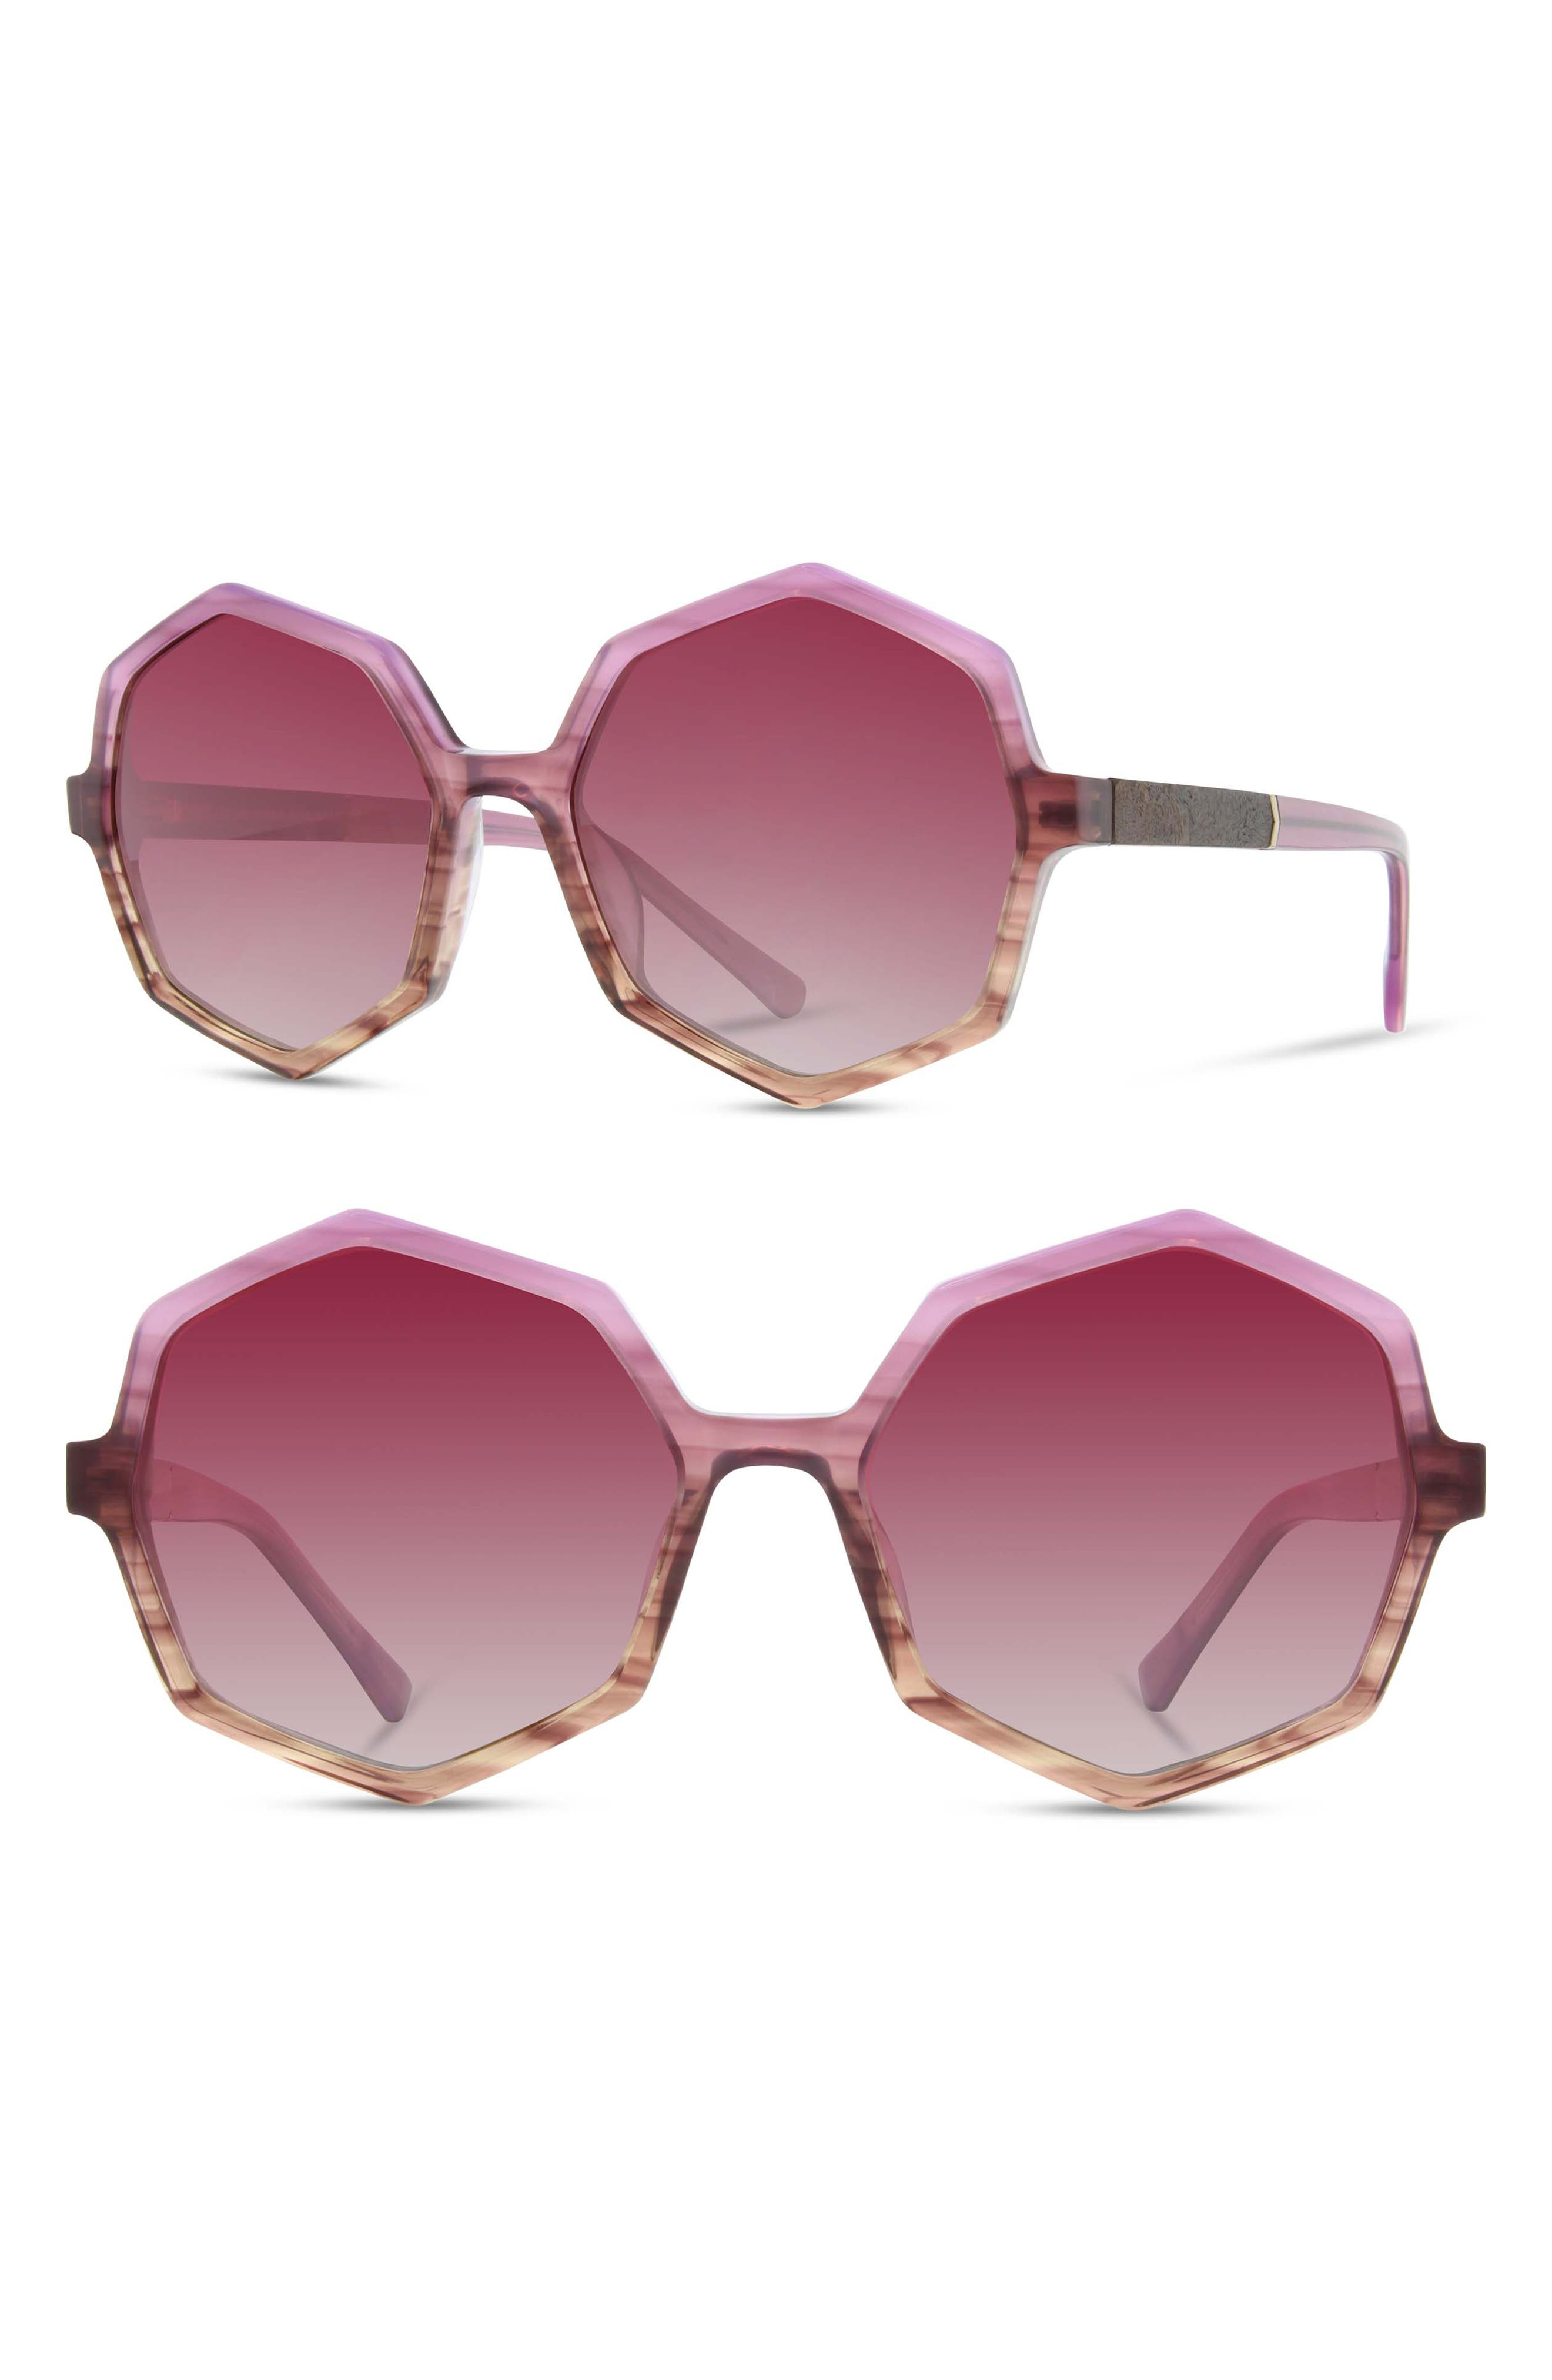 SHWOOD Aurora 57Mm Sunglasses - Lavender/ Elm Burl/ Rose Fade